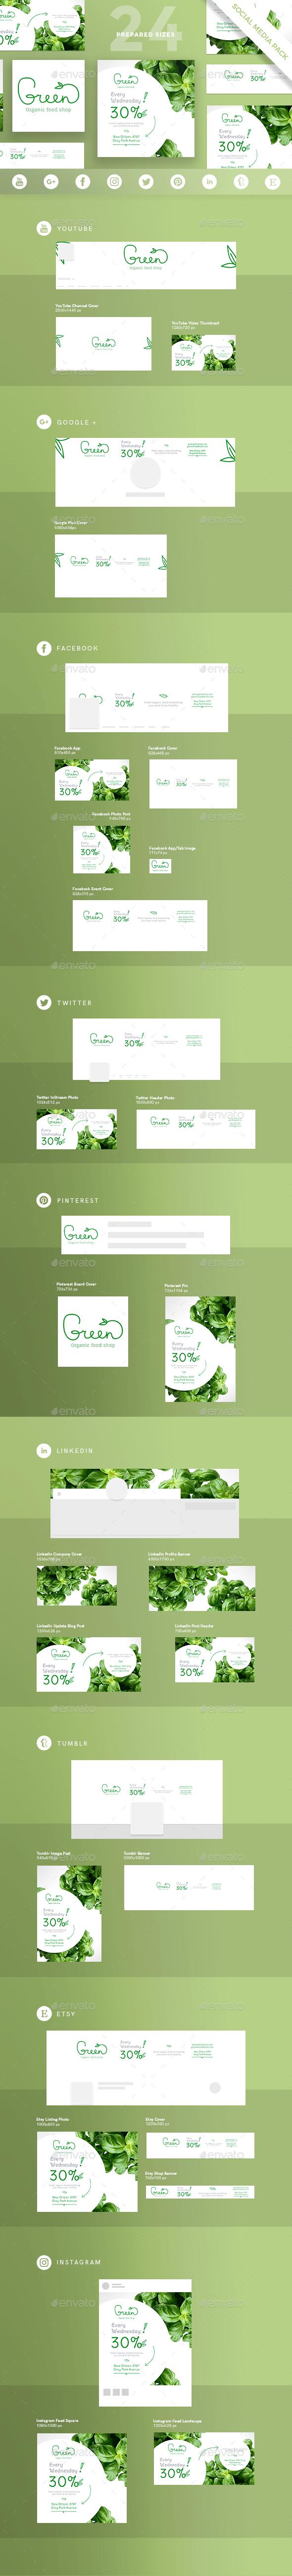 Organic Food Shop Social Media Pack - Miscellaneous Social Media